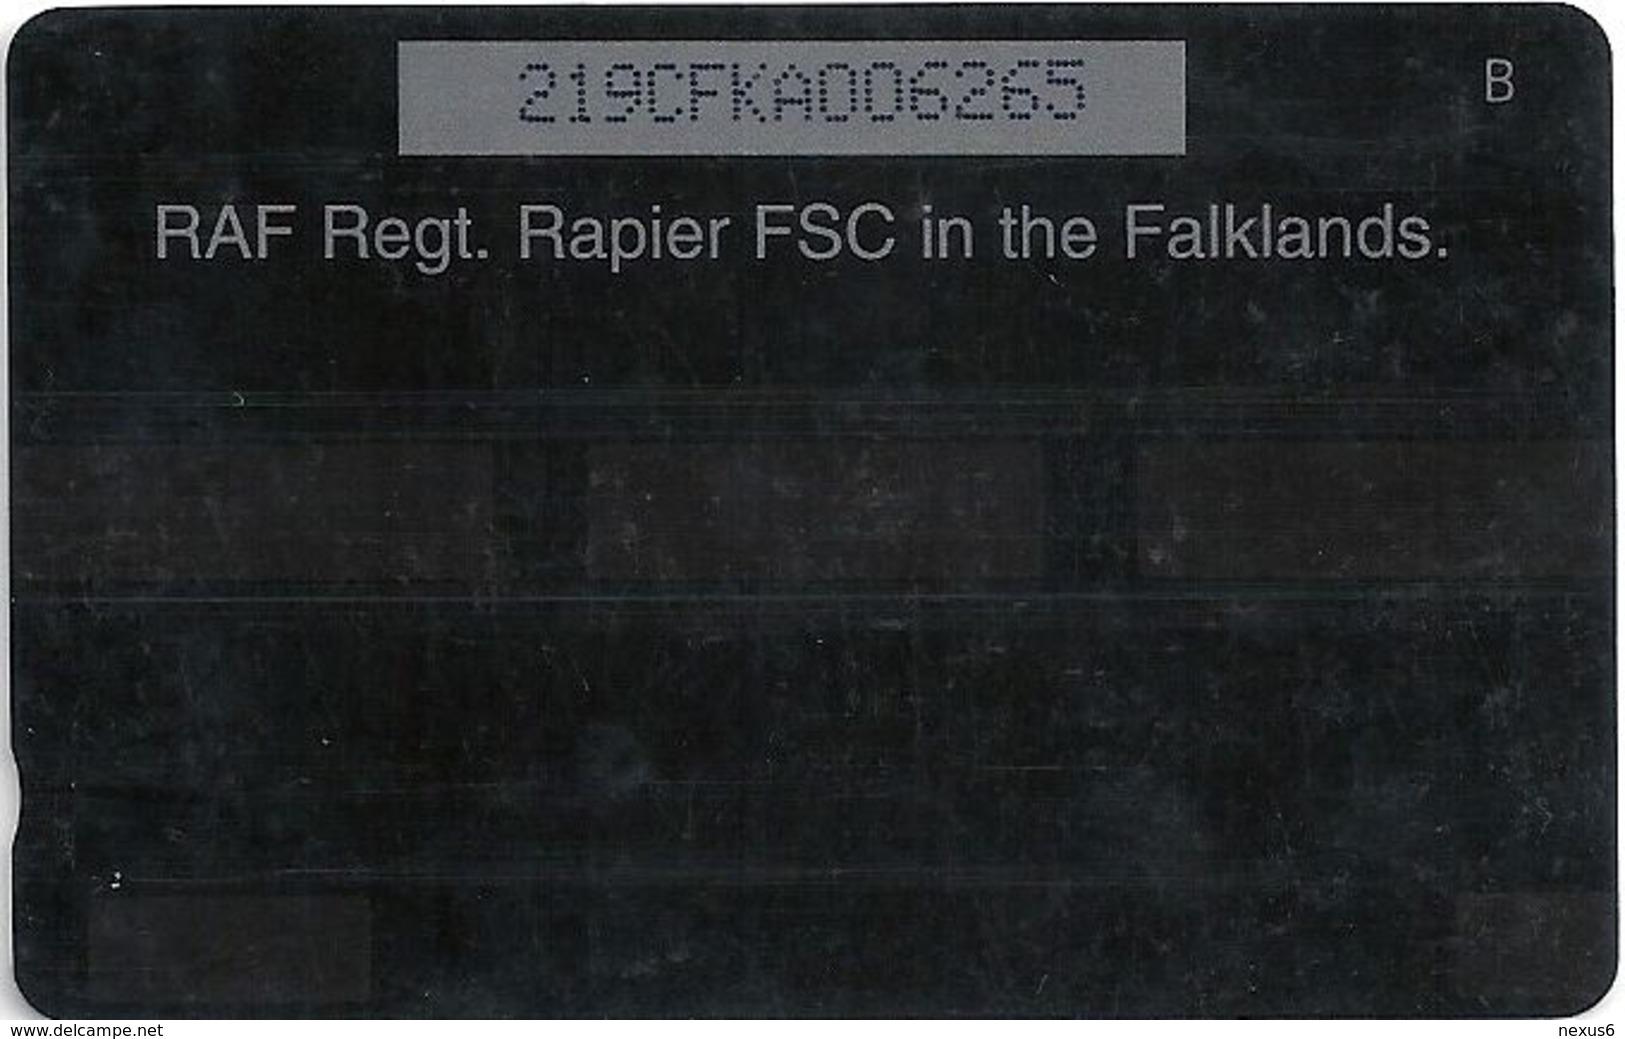 Falklands - Raf Regiment Rapier, 219CFKA, 1998, 10.000ex, Used - Falkland Islands